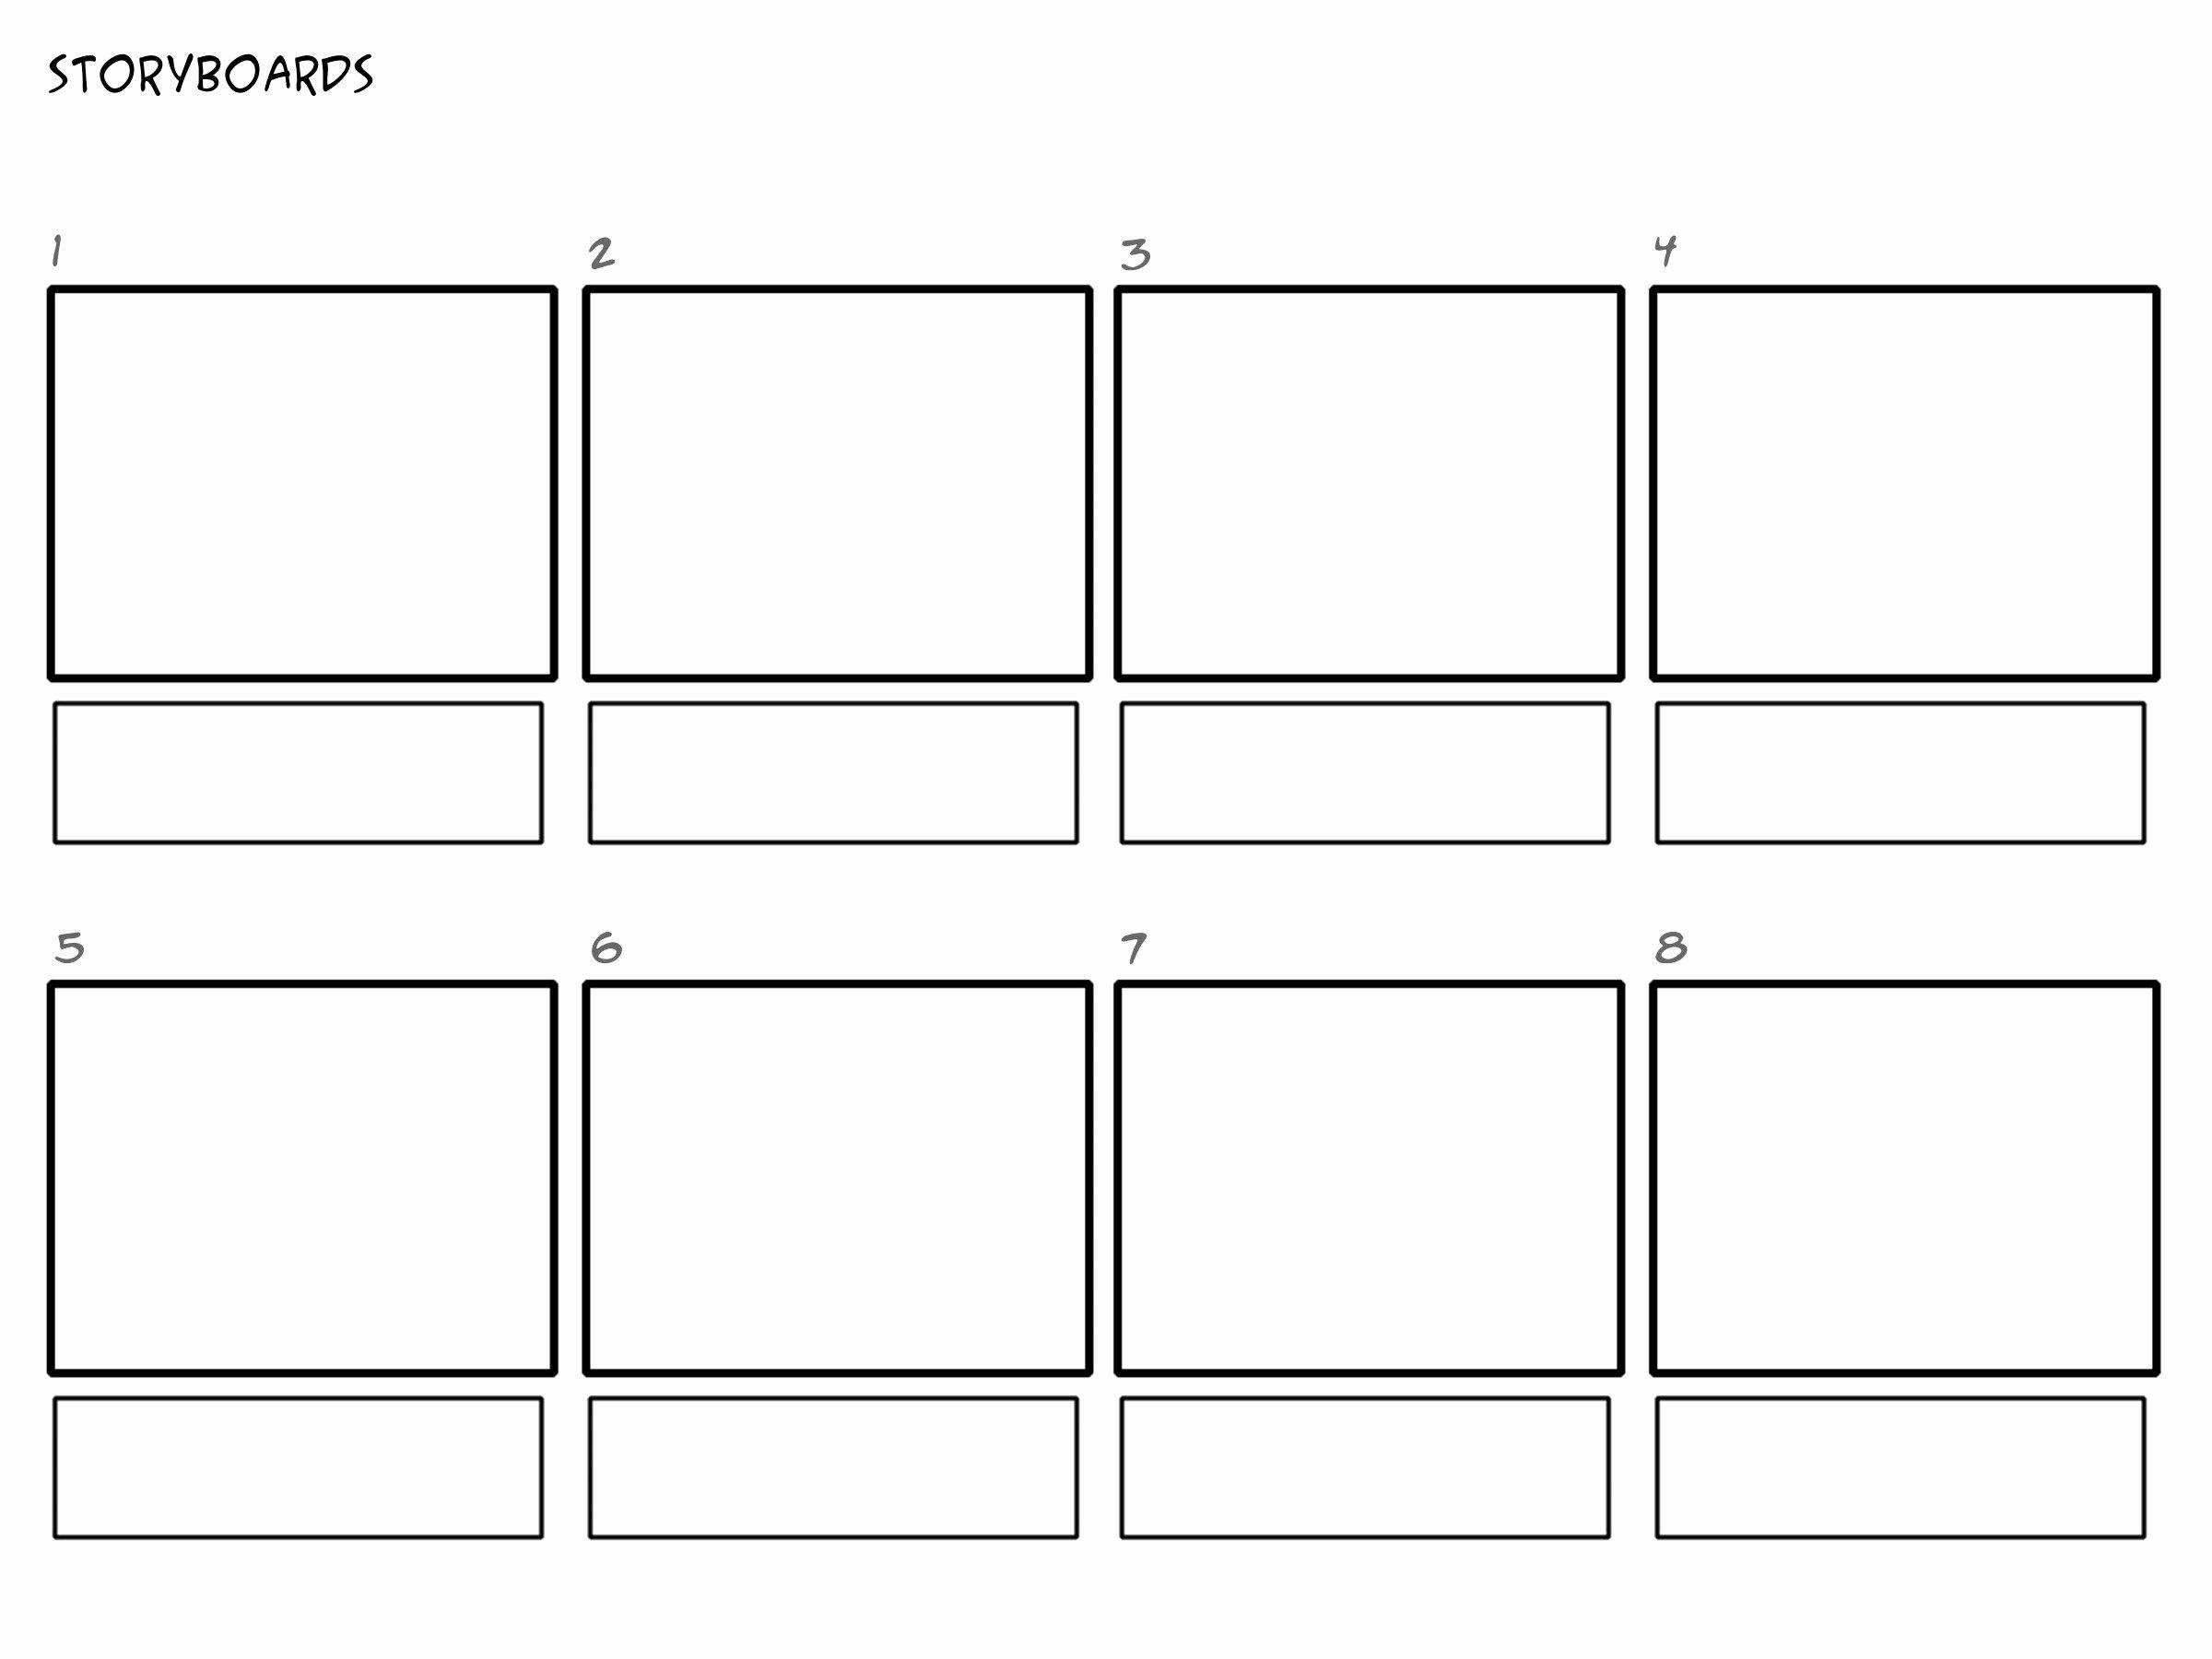 Film Story Board Template Elegant Image Result for Professional Film Storyboard Template